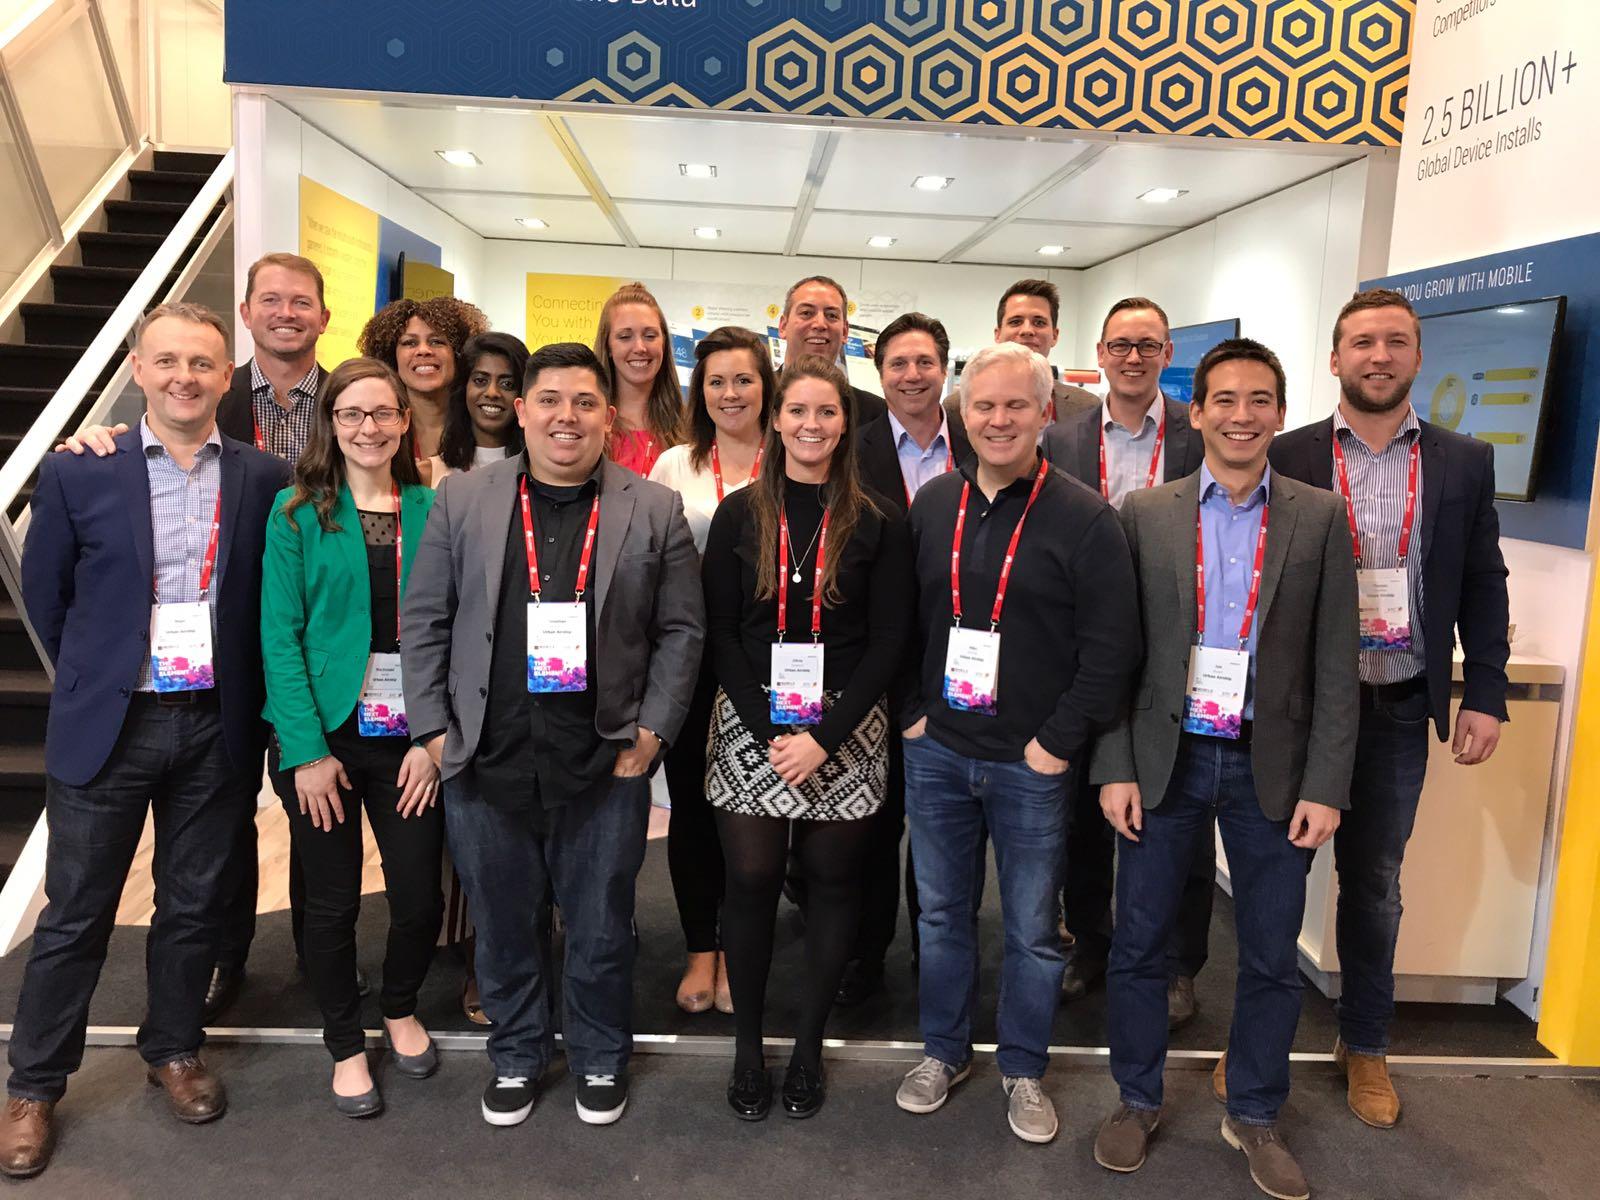 urban-airship-team-at-mobile-world-congress-2017